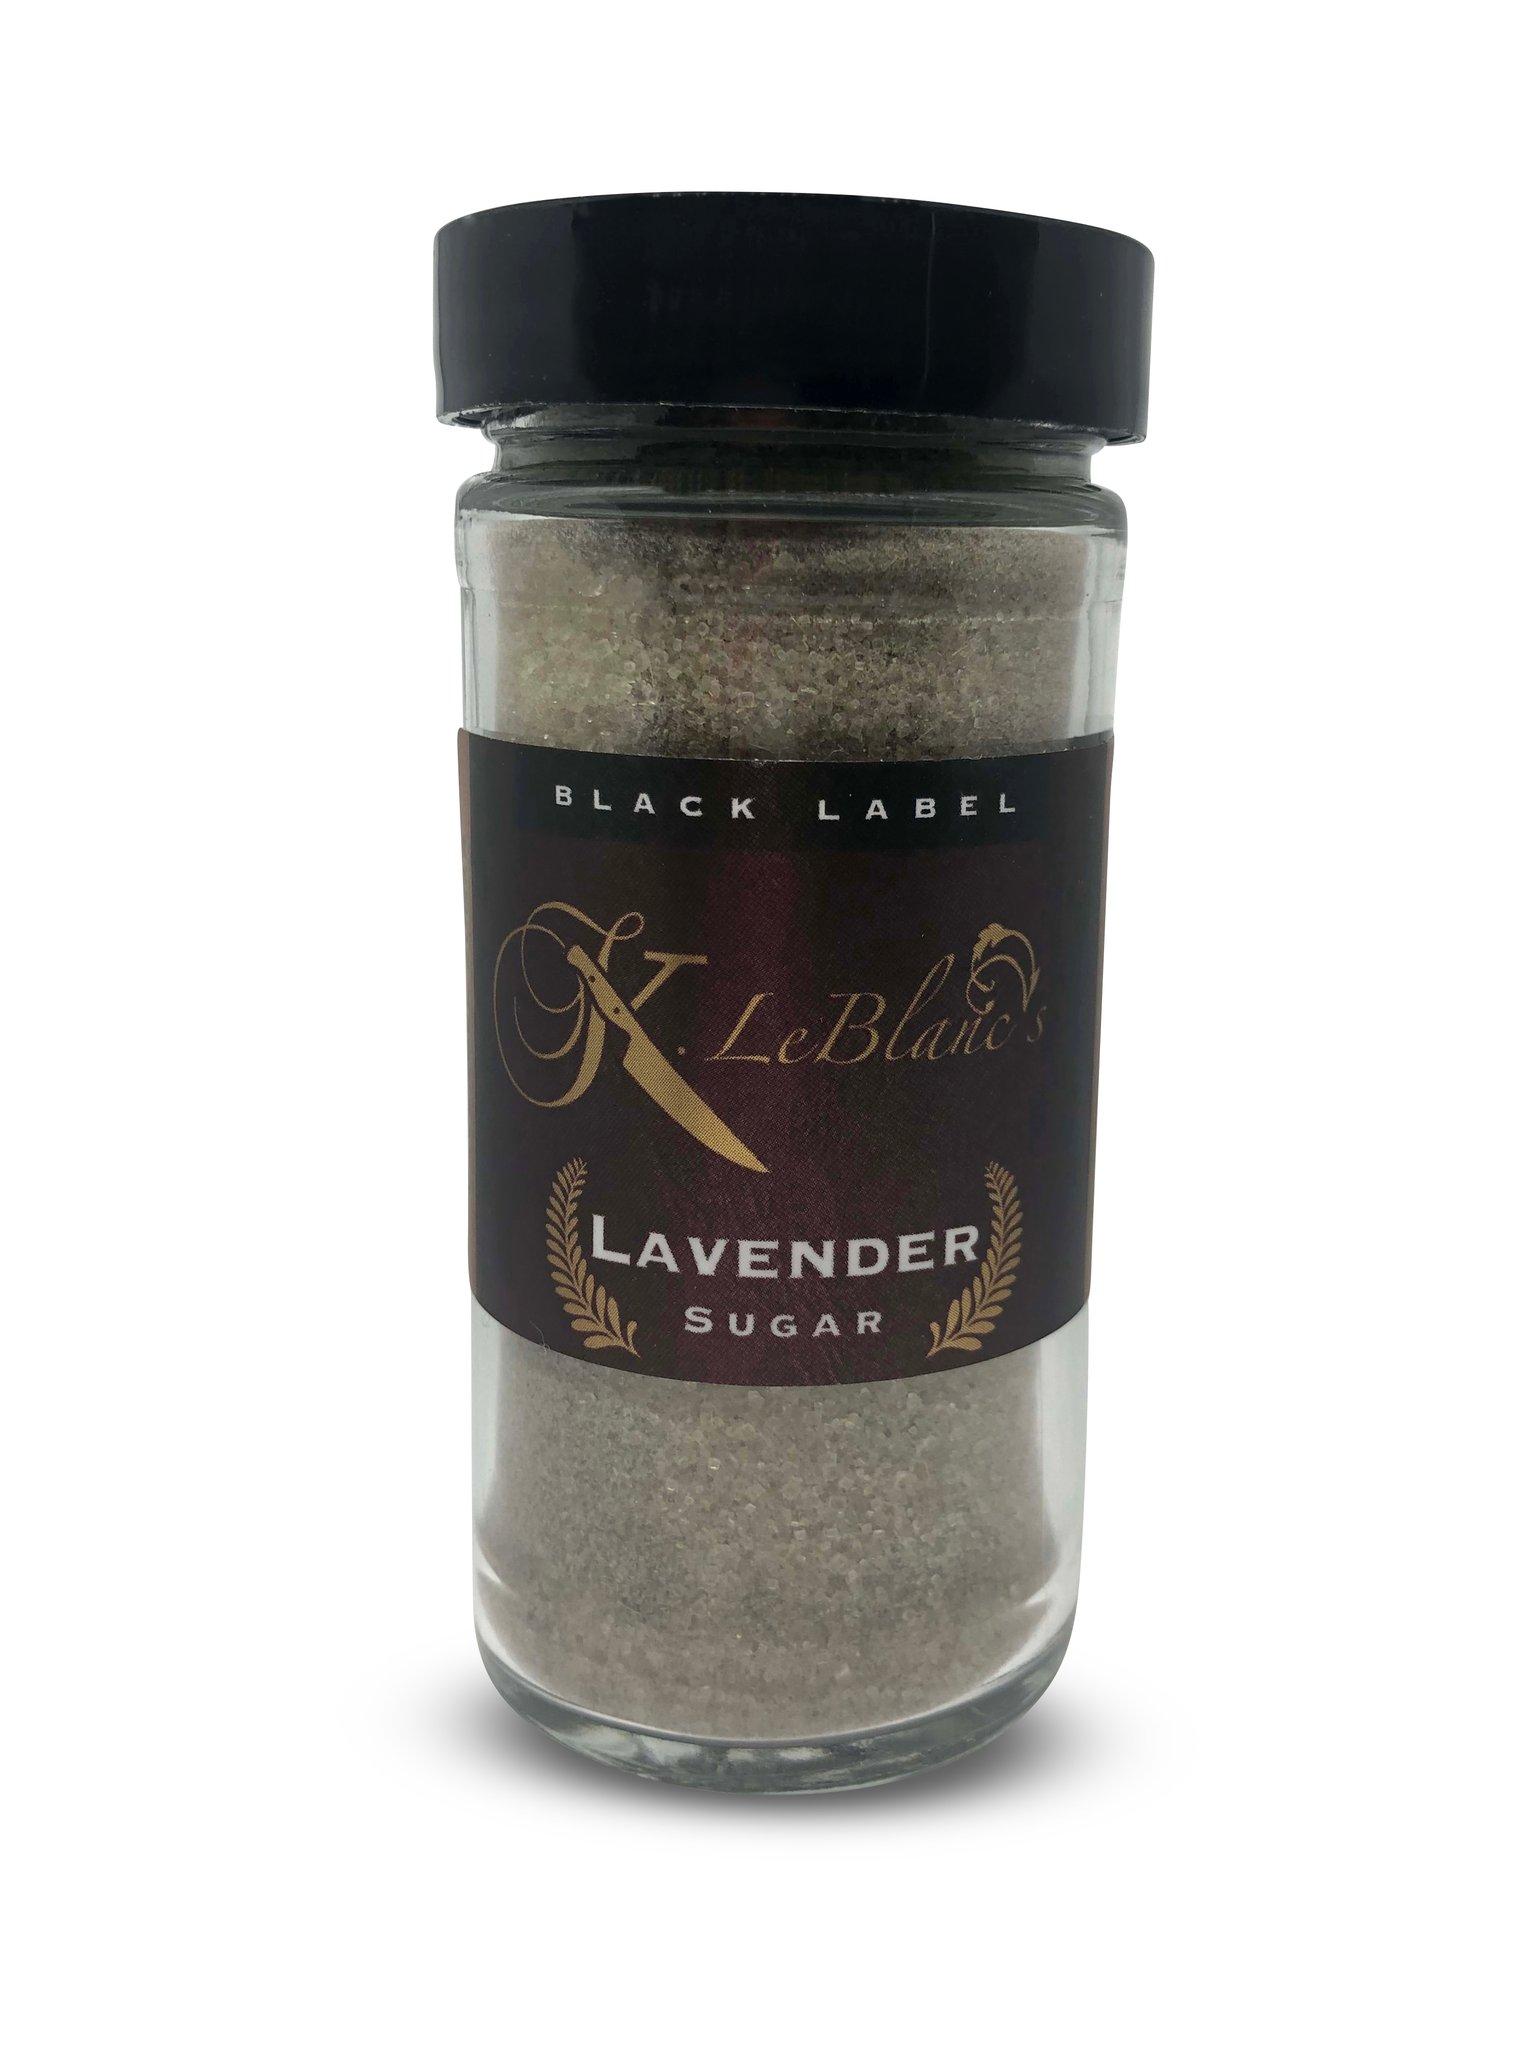 Image of Lavender Sugar